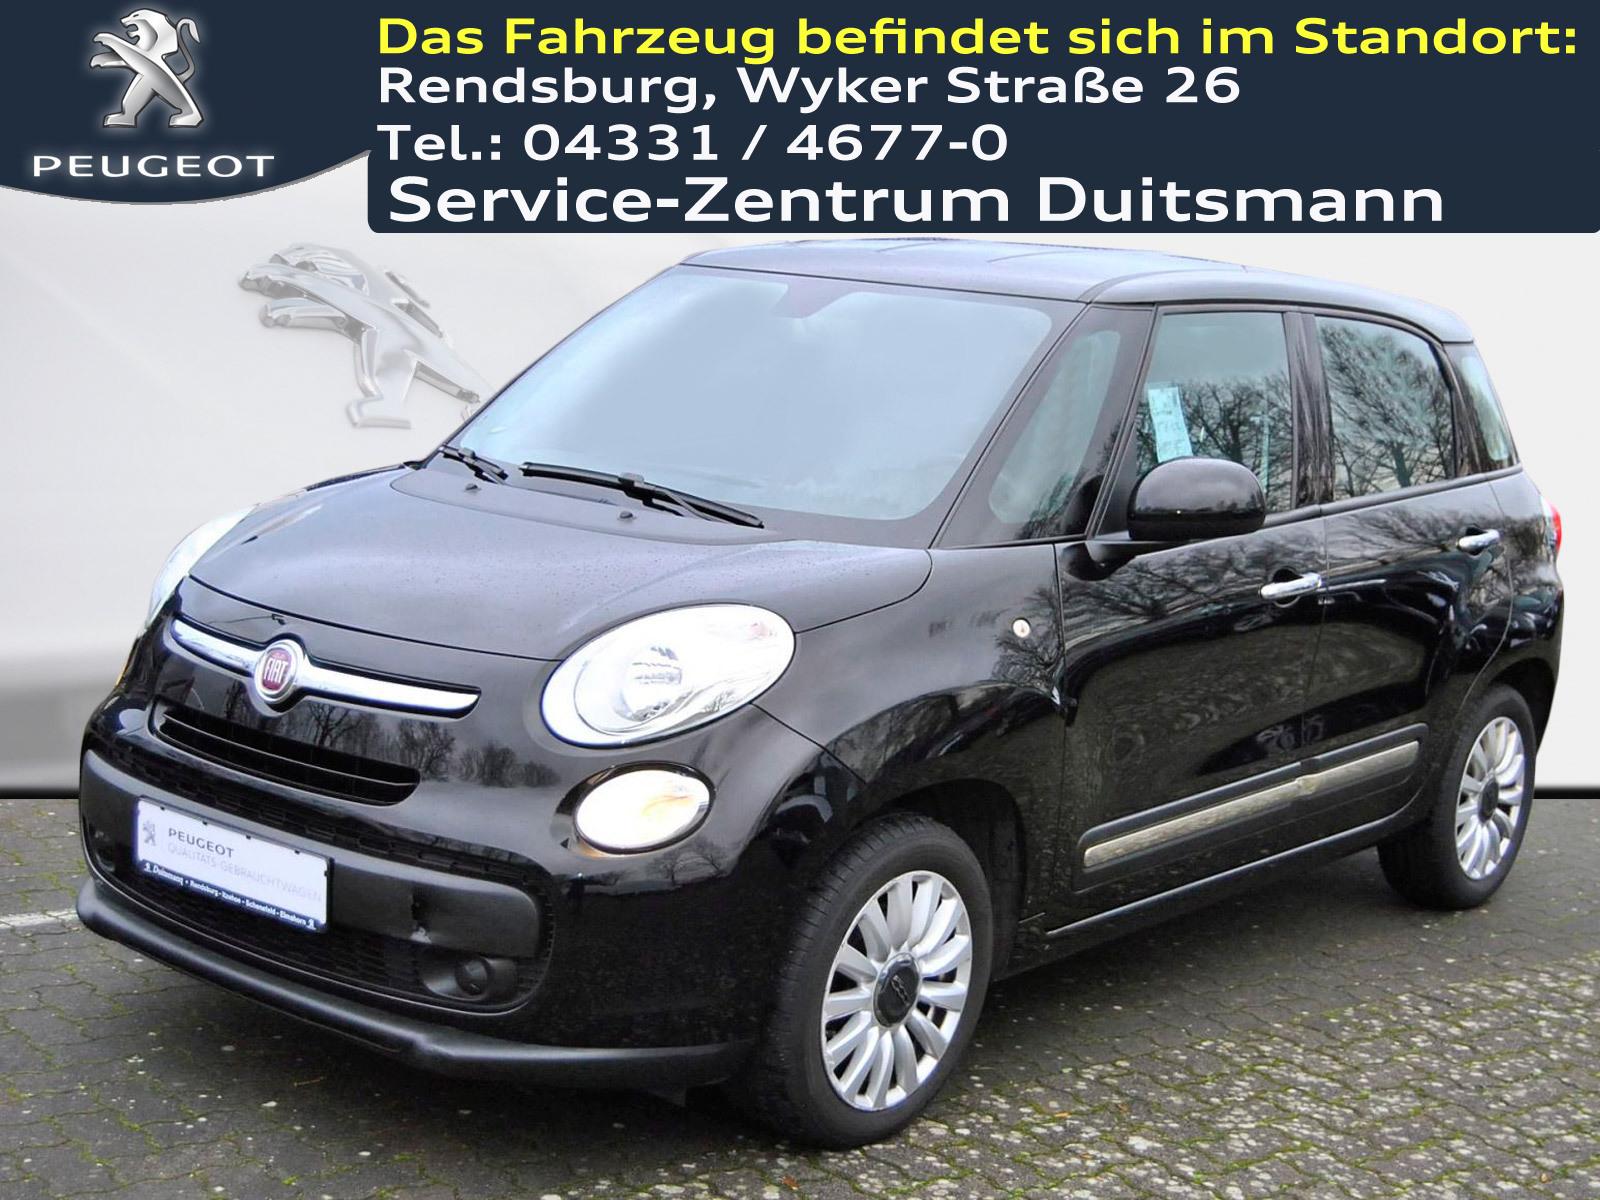 Fiat 500L 1.4 16V Pop-Star, Jahr 2014, Benzin